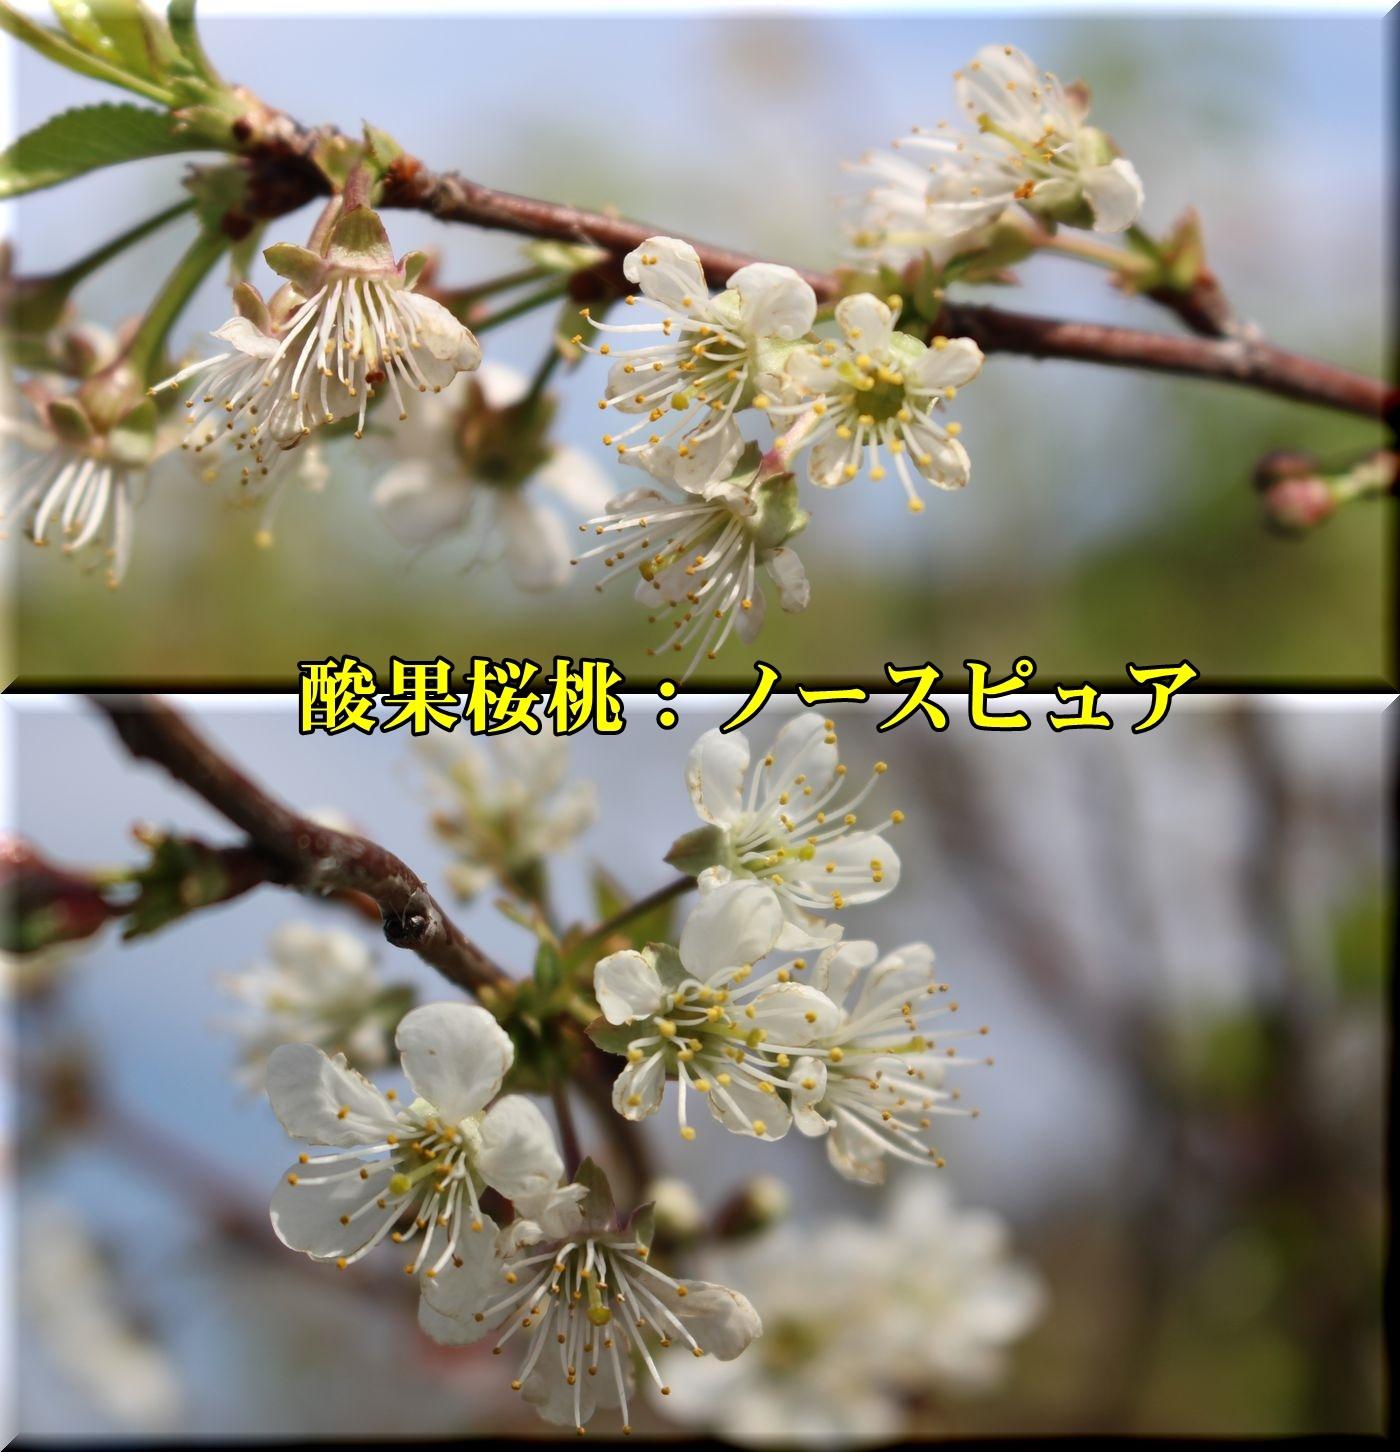 2nothpur180412_033.jpg